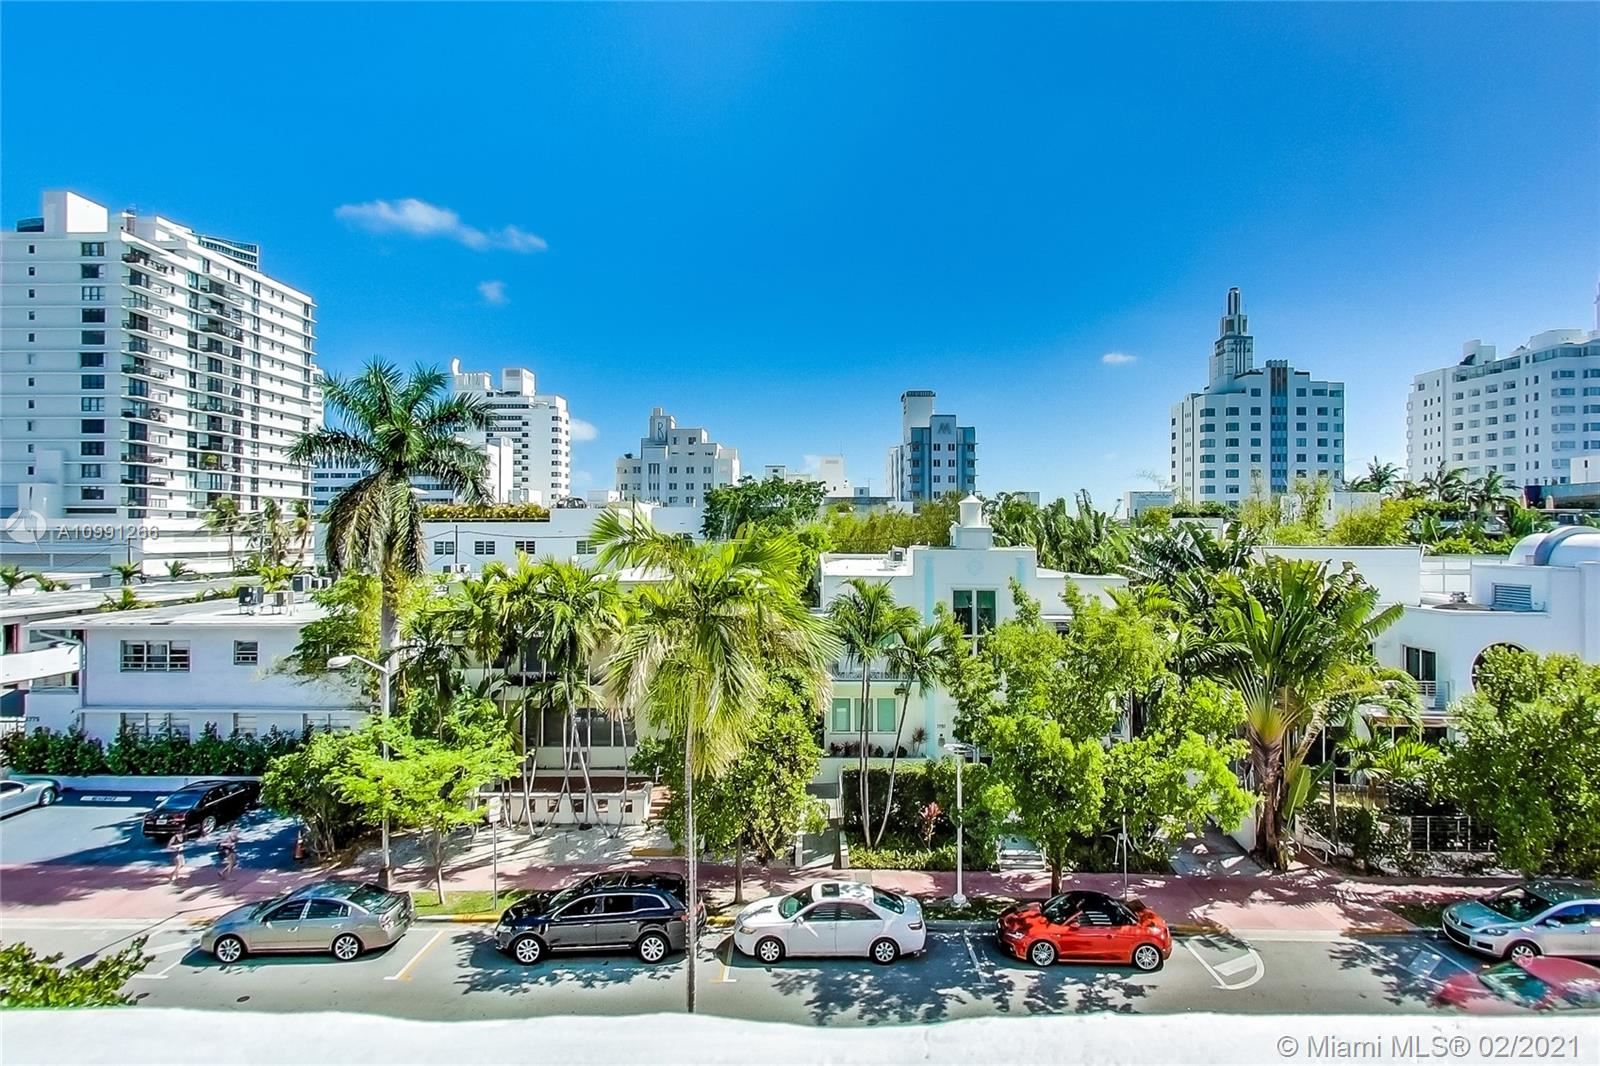 1750 James Ave #4F, Miami Beach, FL 33139 - #: A10991266